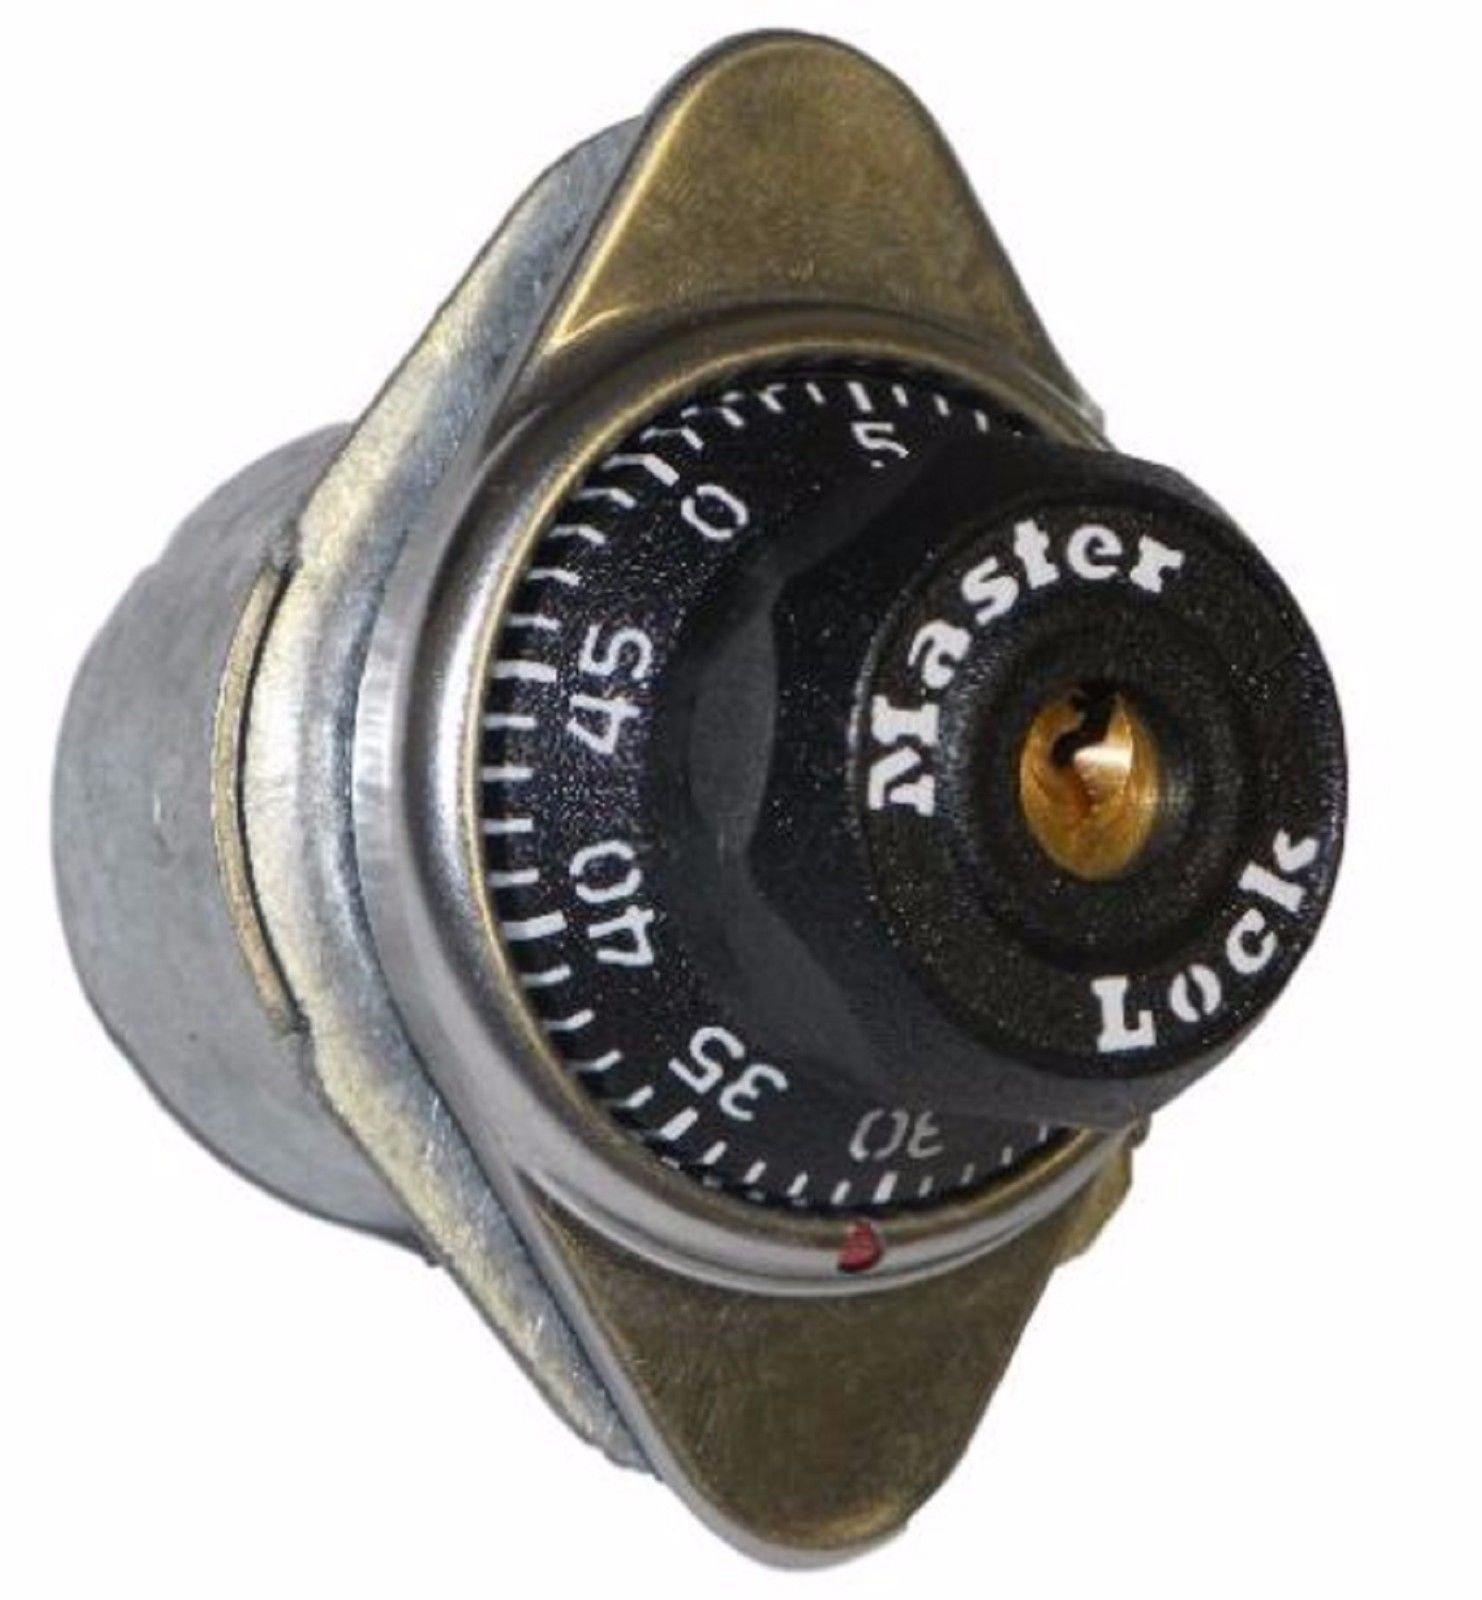 Master Lock 1654 Locker Lock. . Built-In Combination Lock. Automatic Horizontal Spring Bolt for Box Lockers. Right Hand. PLASTIC DIAL